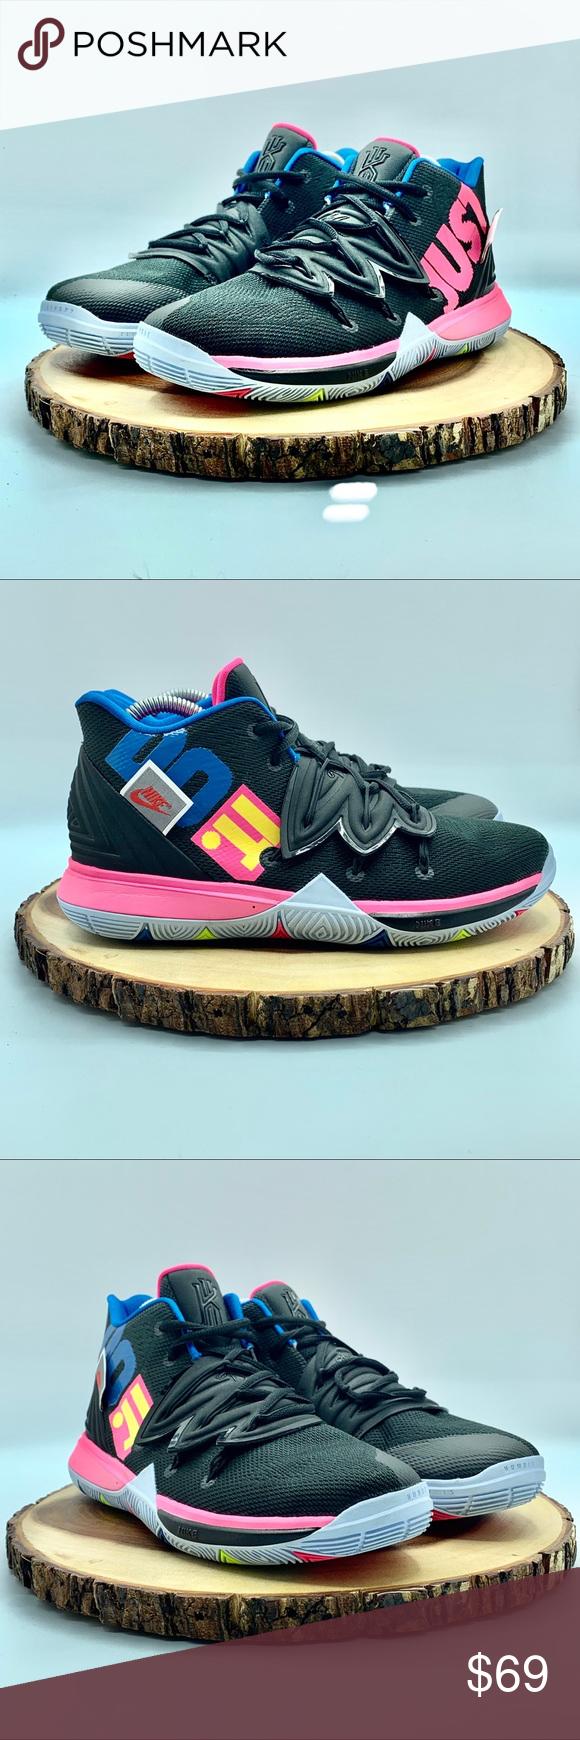 Nike Kylie 5 Just Do It Youth Basketball Shoe SZ 7 Women's